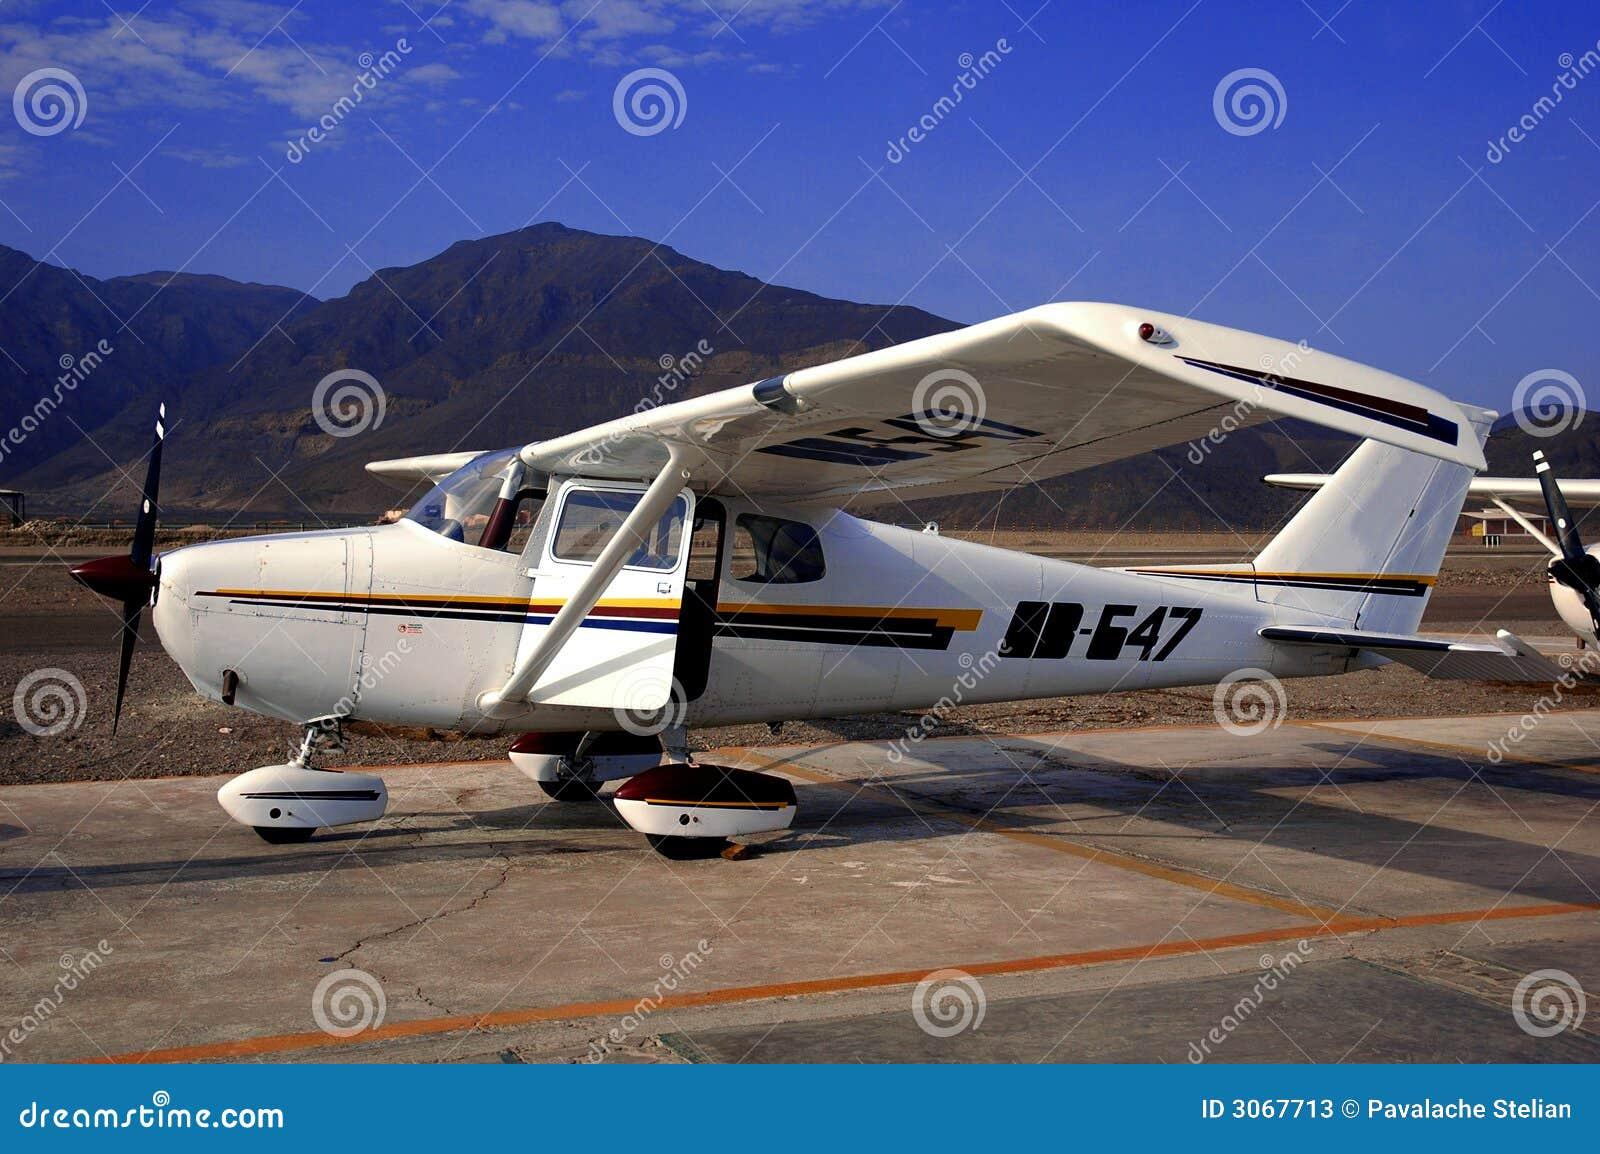 Single Engine Prop Plane Stock Photos - Image: 3067713